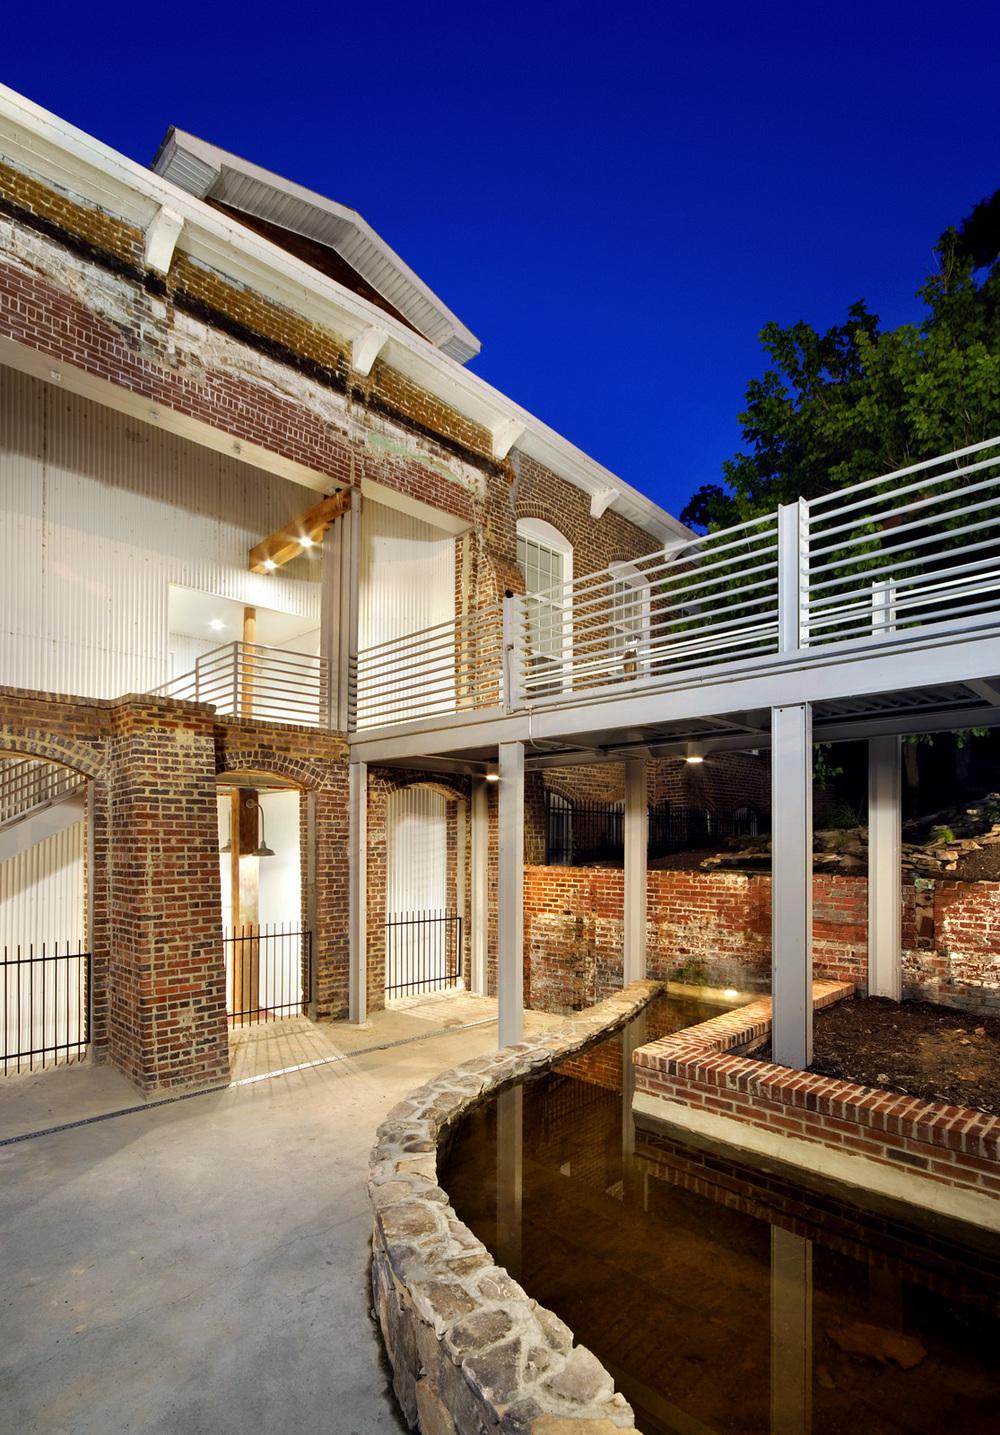 Rivermill Apts exteriors 06 034.jpg